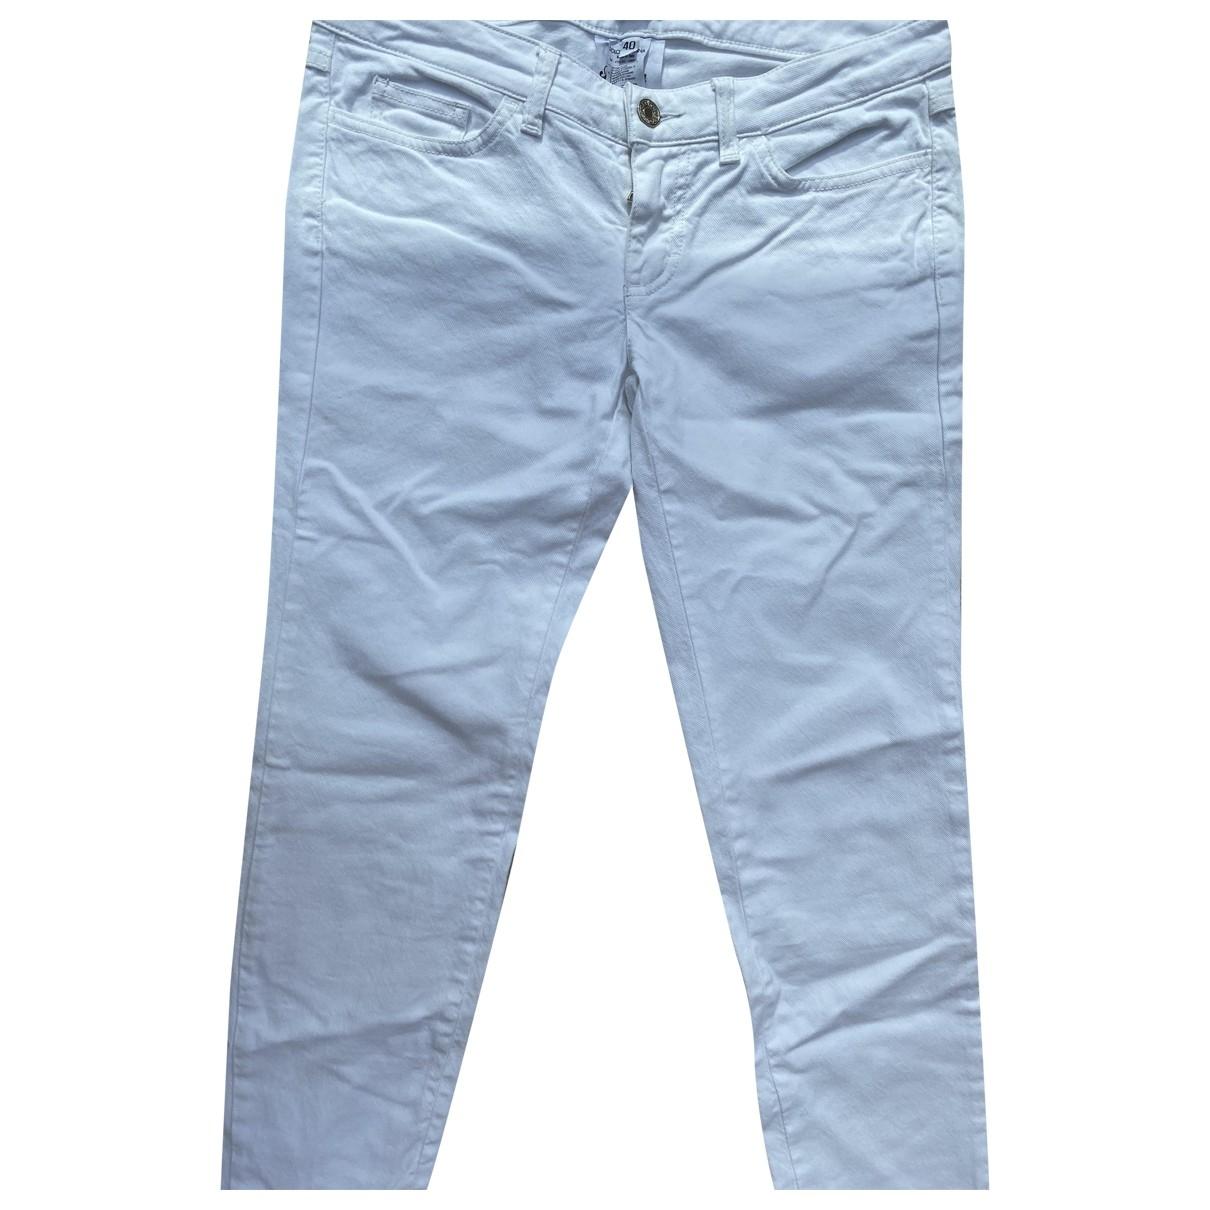 Dolce & Gabbana \N White Cotton - elasthane Jeans for Women 36 FR